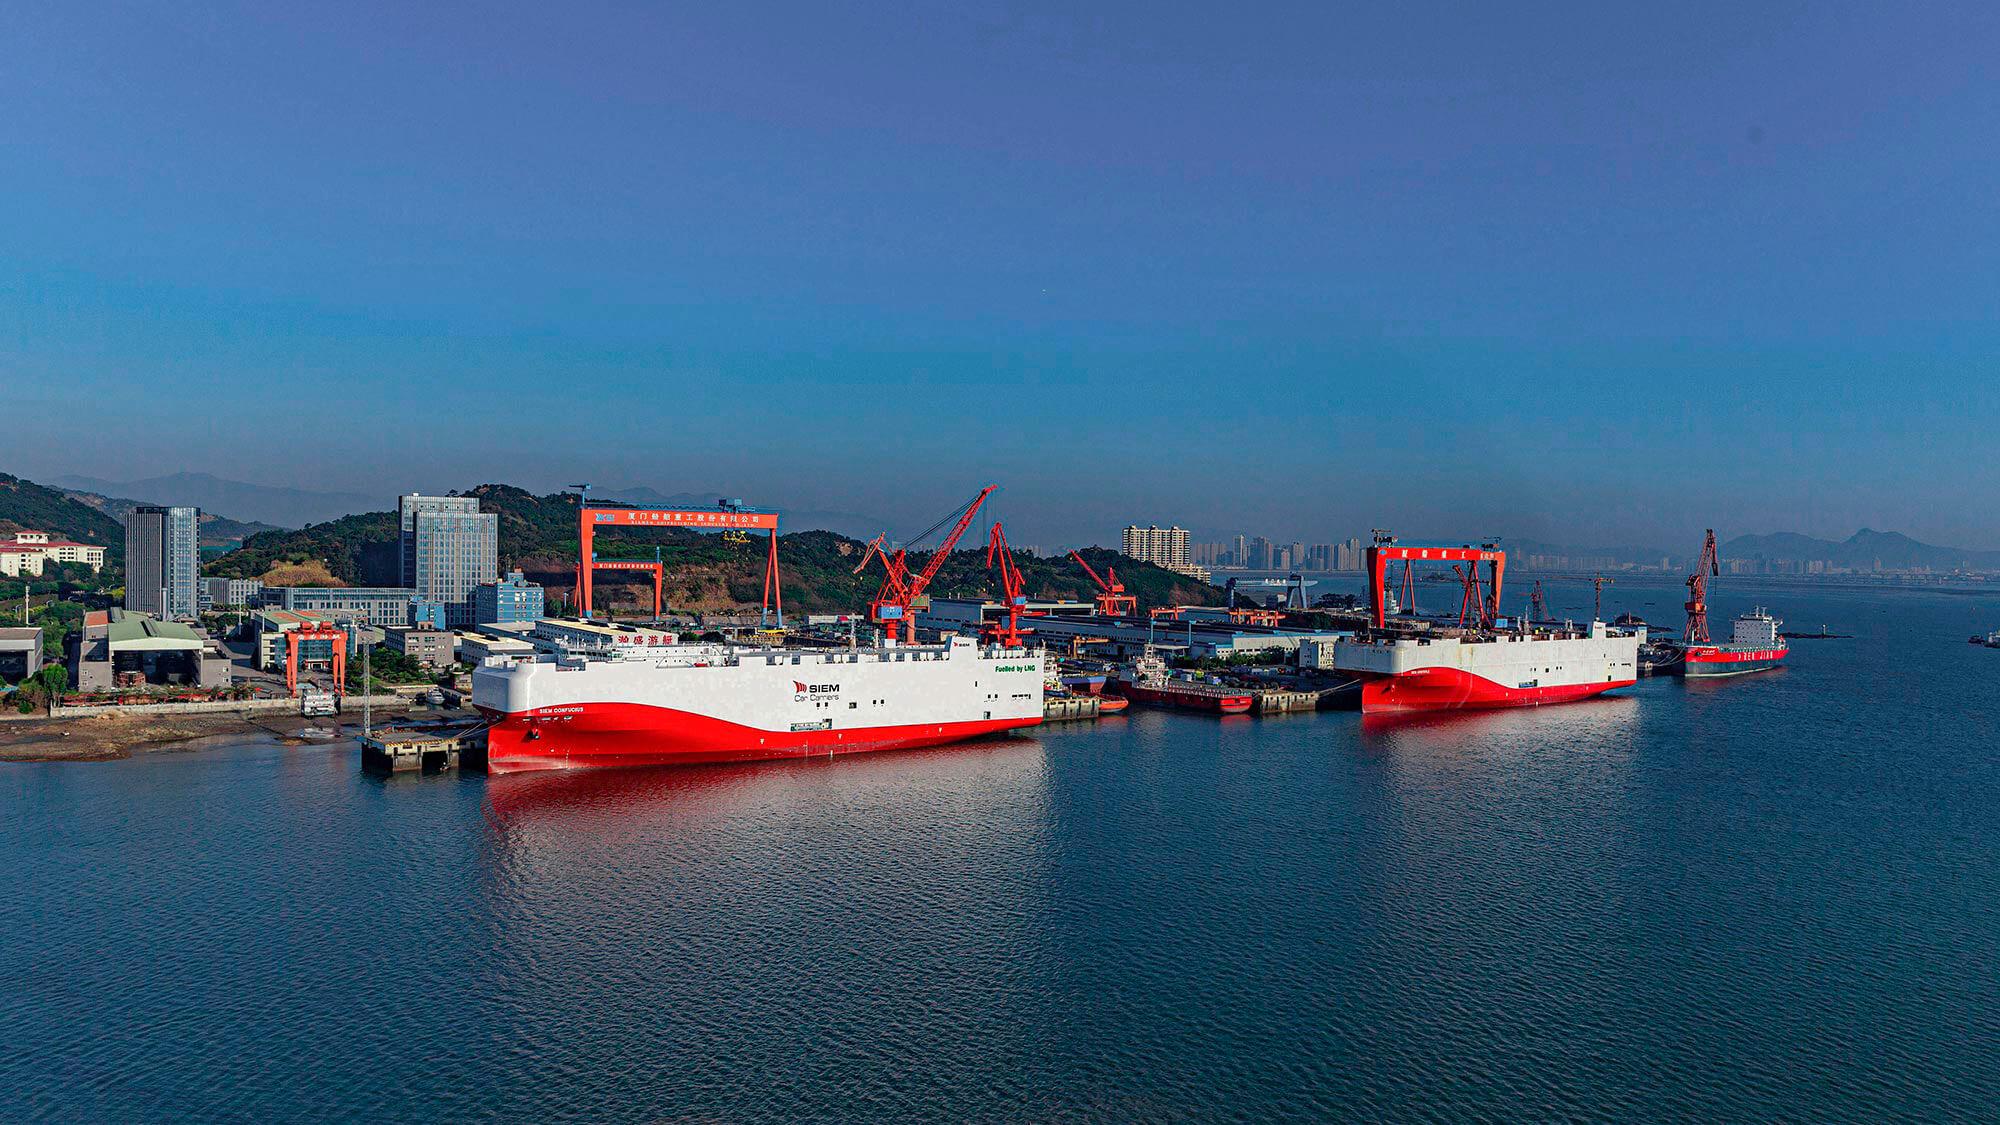 Volkswagen Group - Ιδιόκτητος στόλος πλοίων μεταφοράς αυτοκίνητων - Πλοία LNG